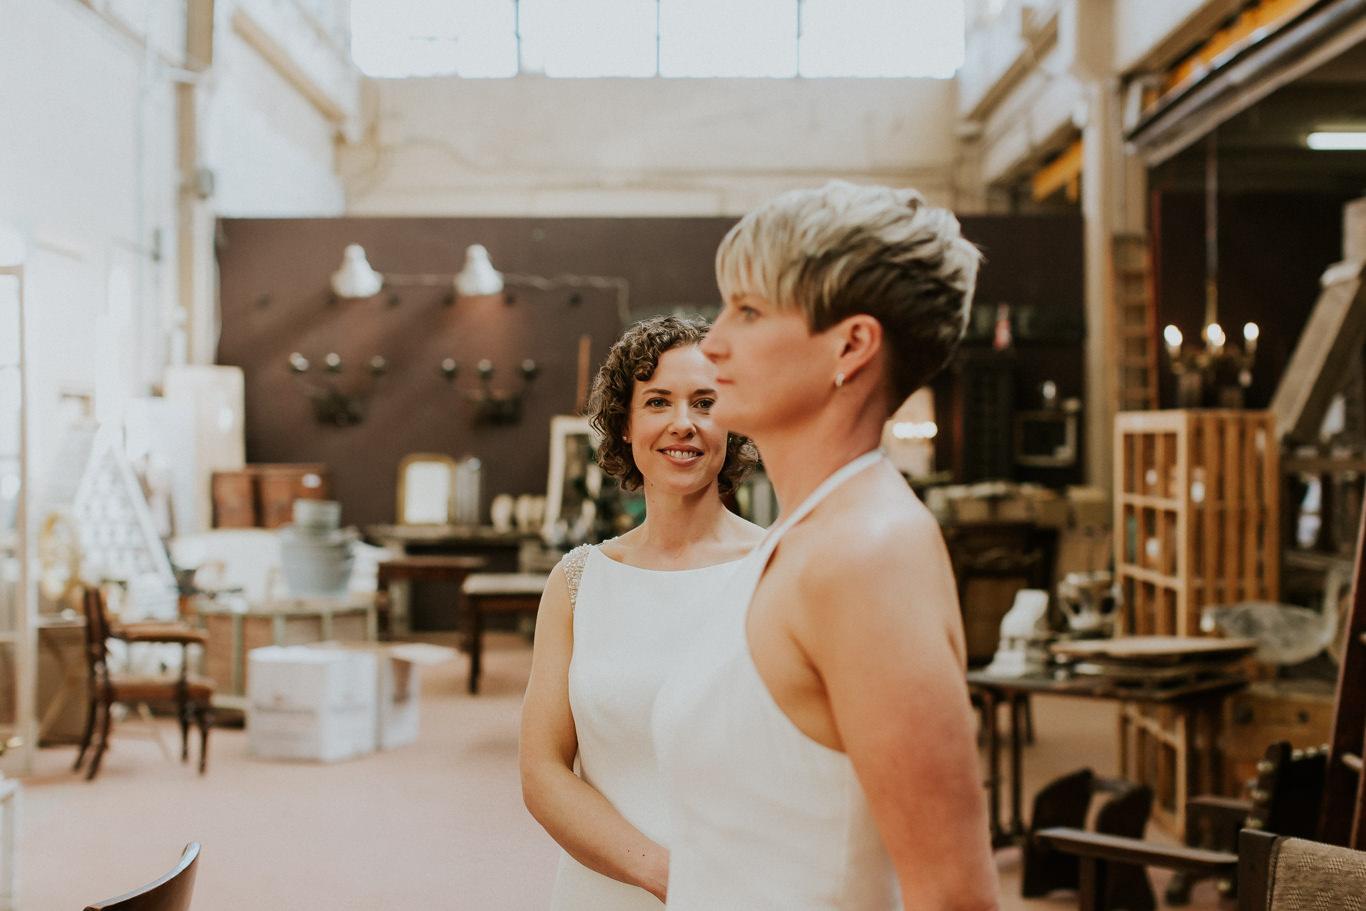 Lindsay-and-Heather-Charbar-Restaurant-Wedding-in-Calgary-53